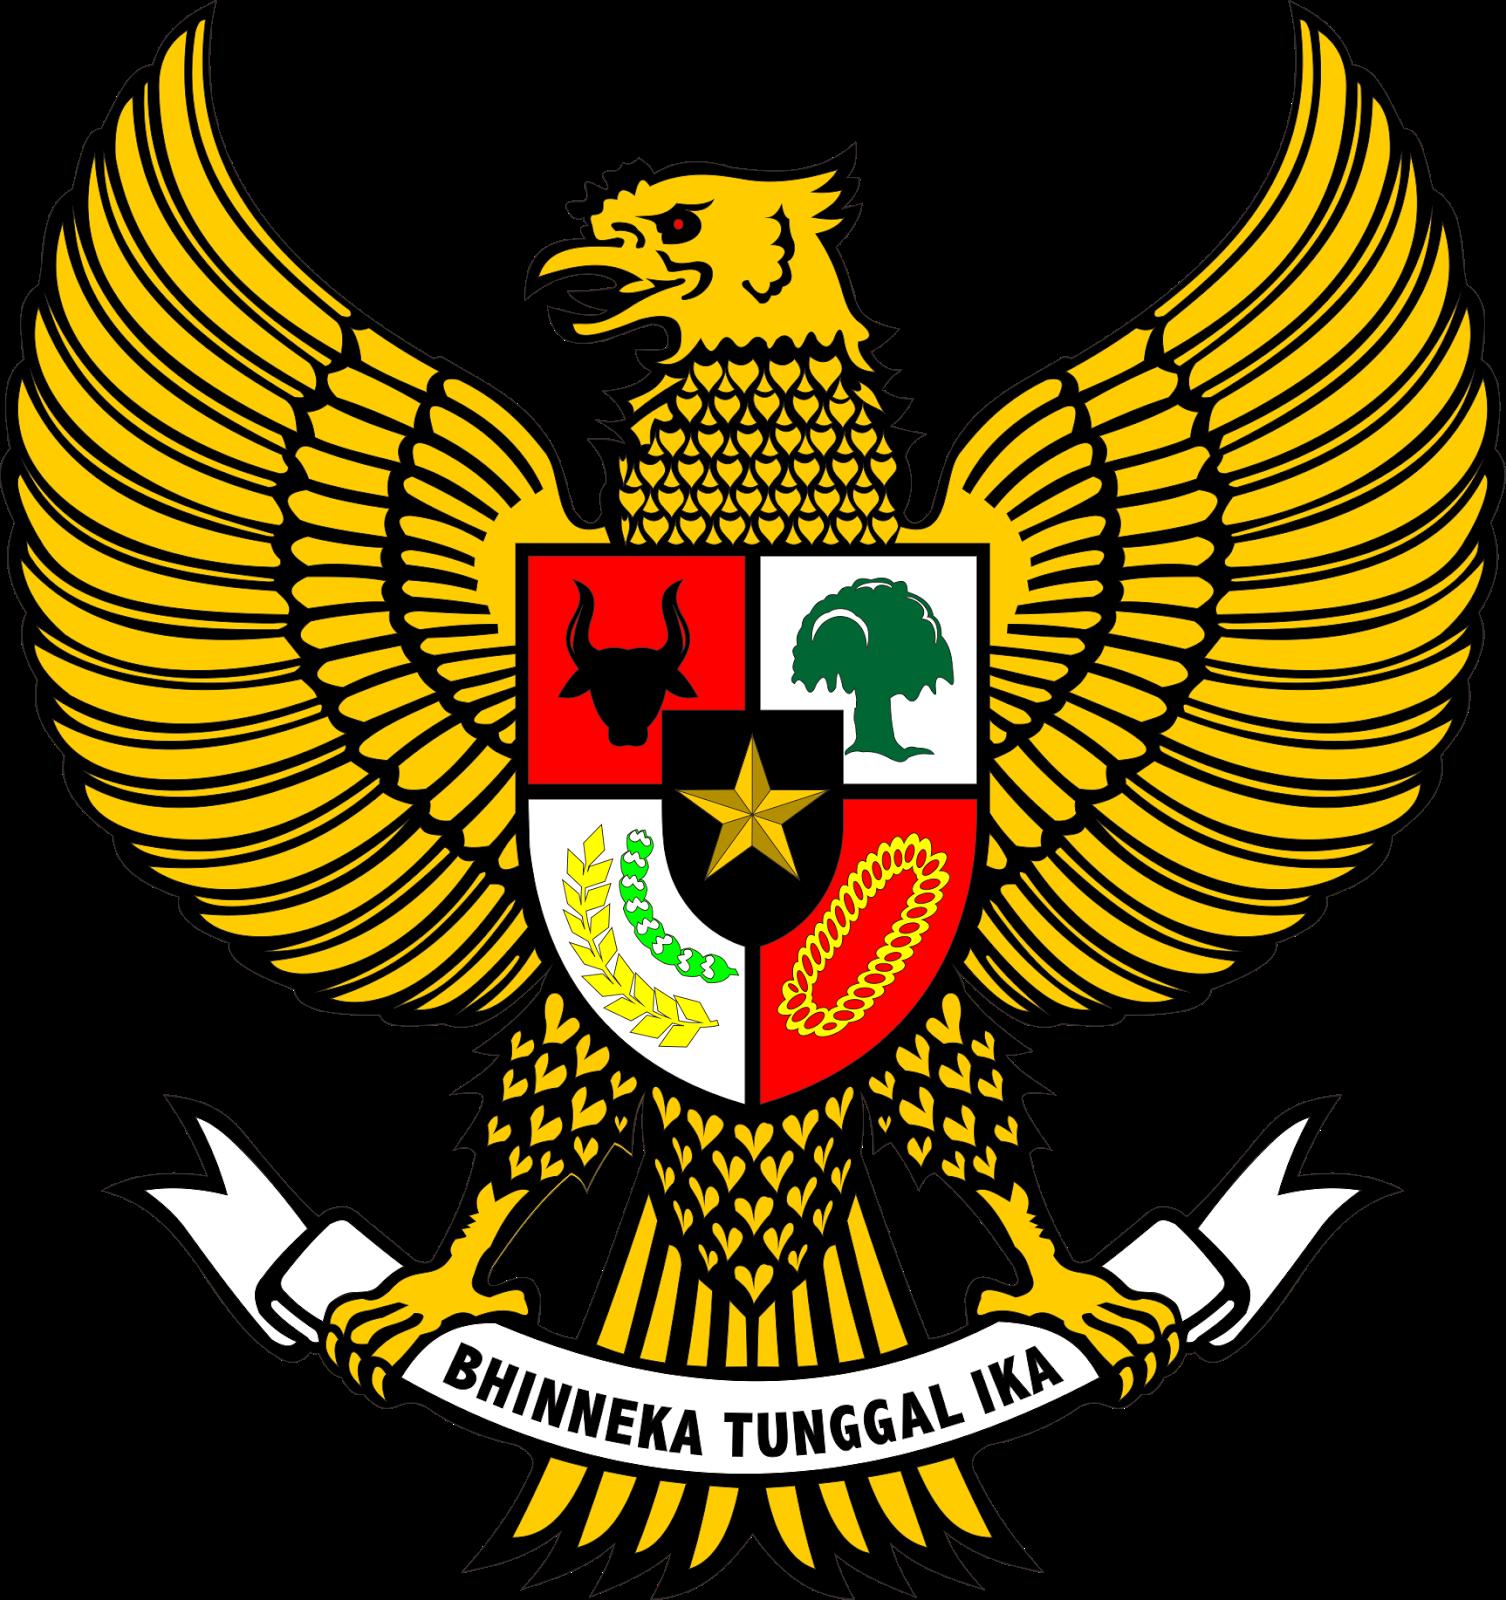 Lambang Negara Indonesia Bhinneka Tunggal Ika Jpg Png Corel Dan Hitam Putih Kutokarin